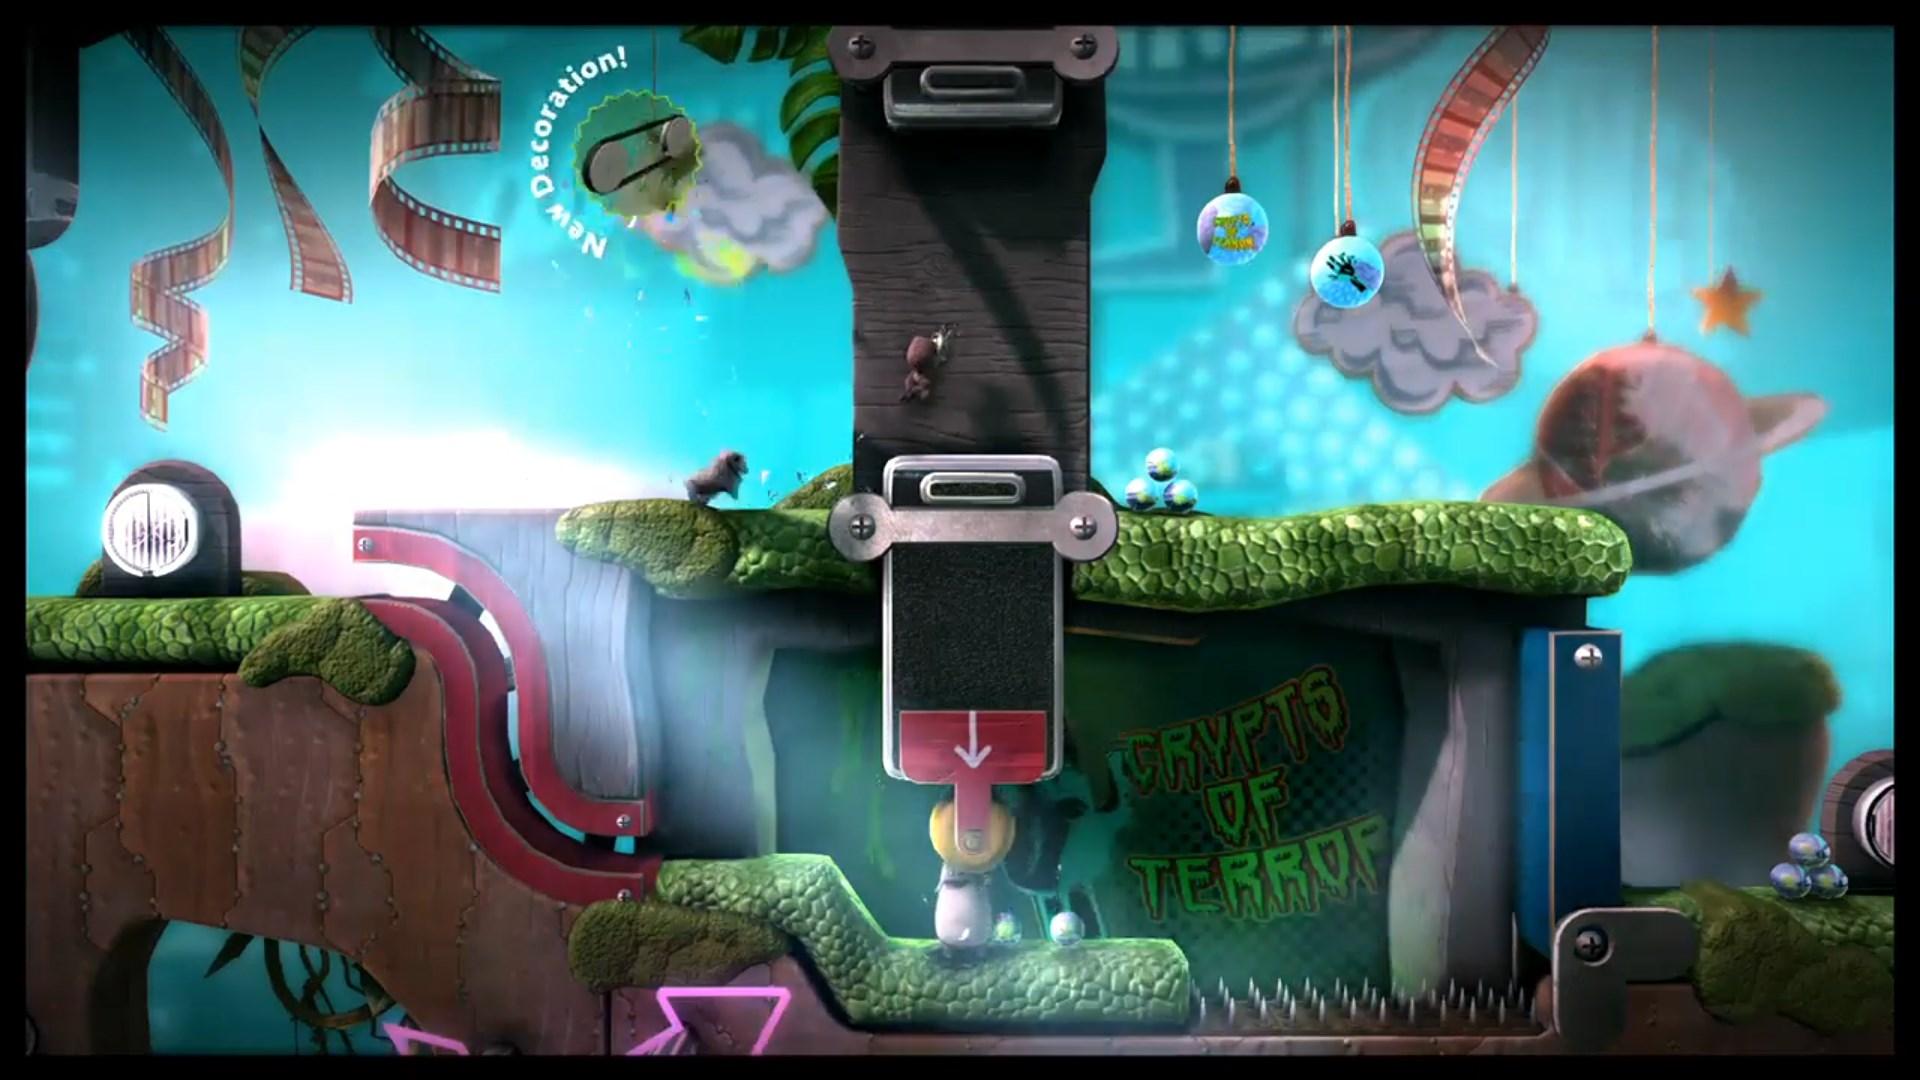 LagZero Analiza: LittleBigPlanet 3 [Review artesanal]